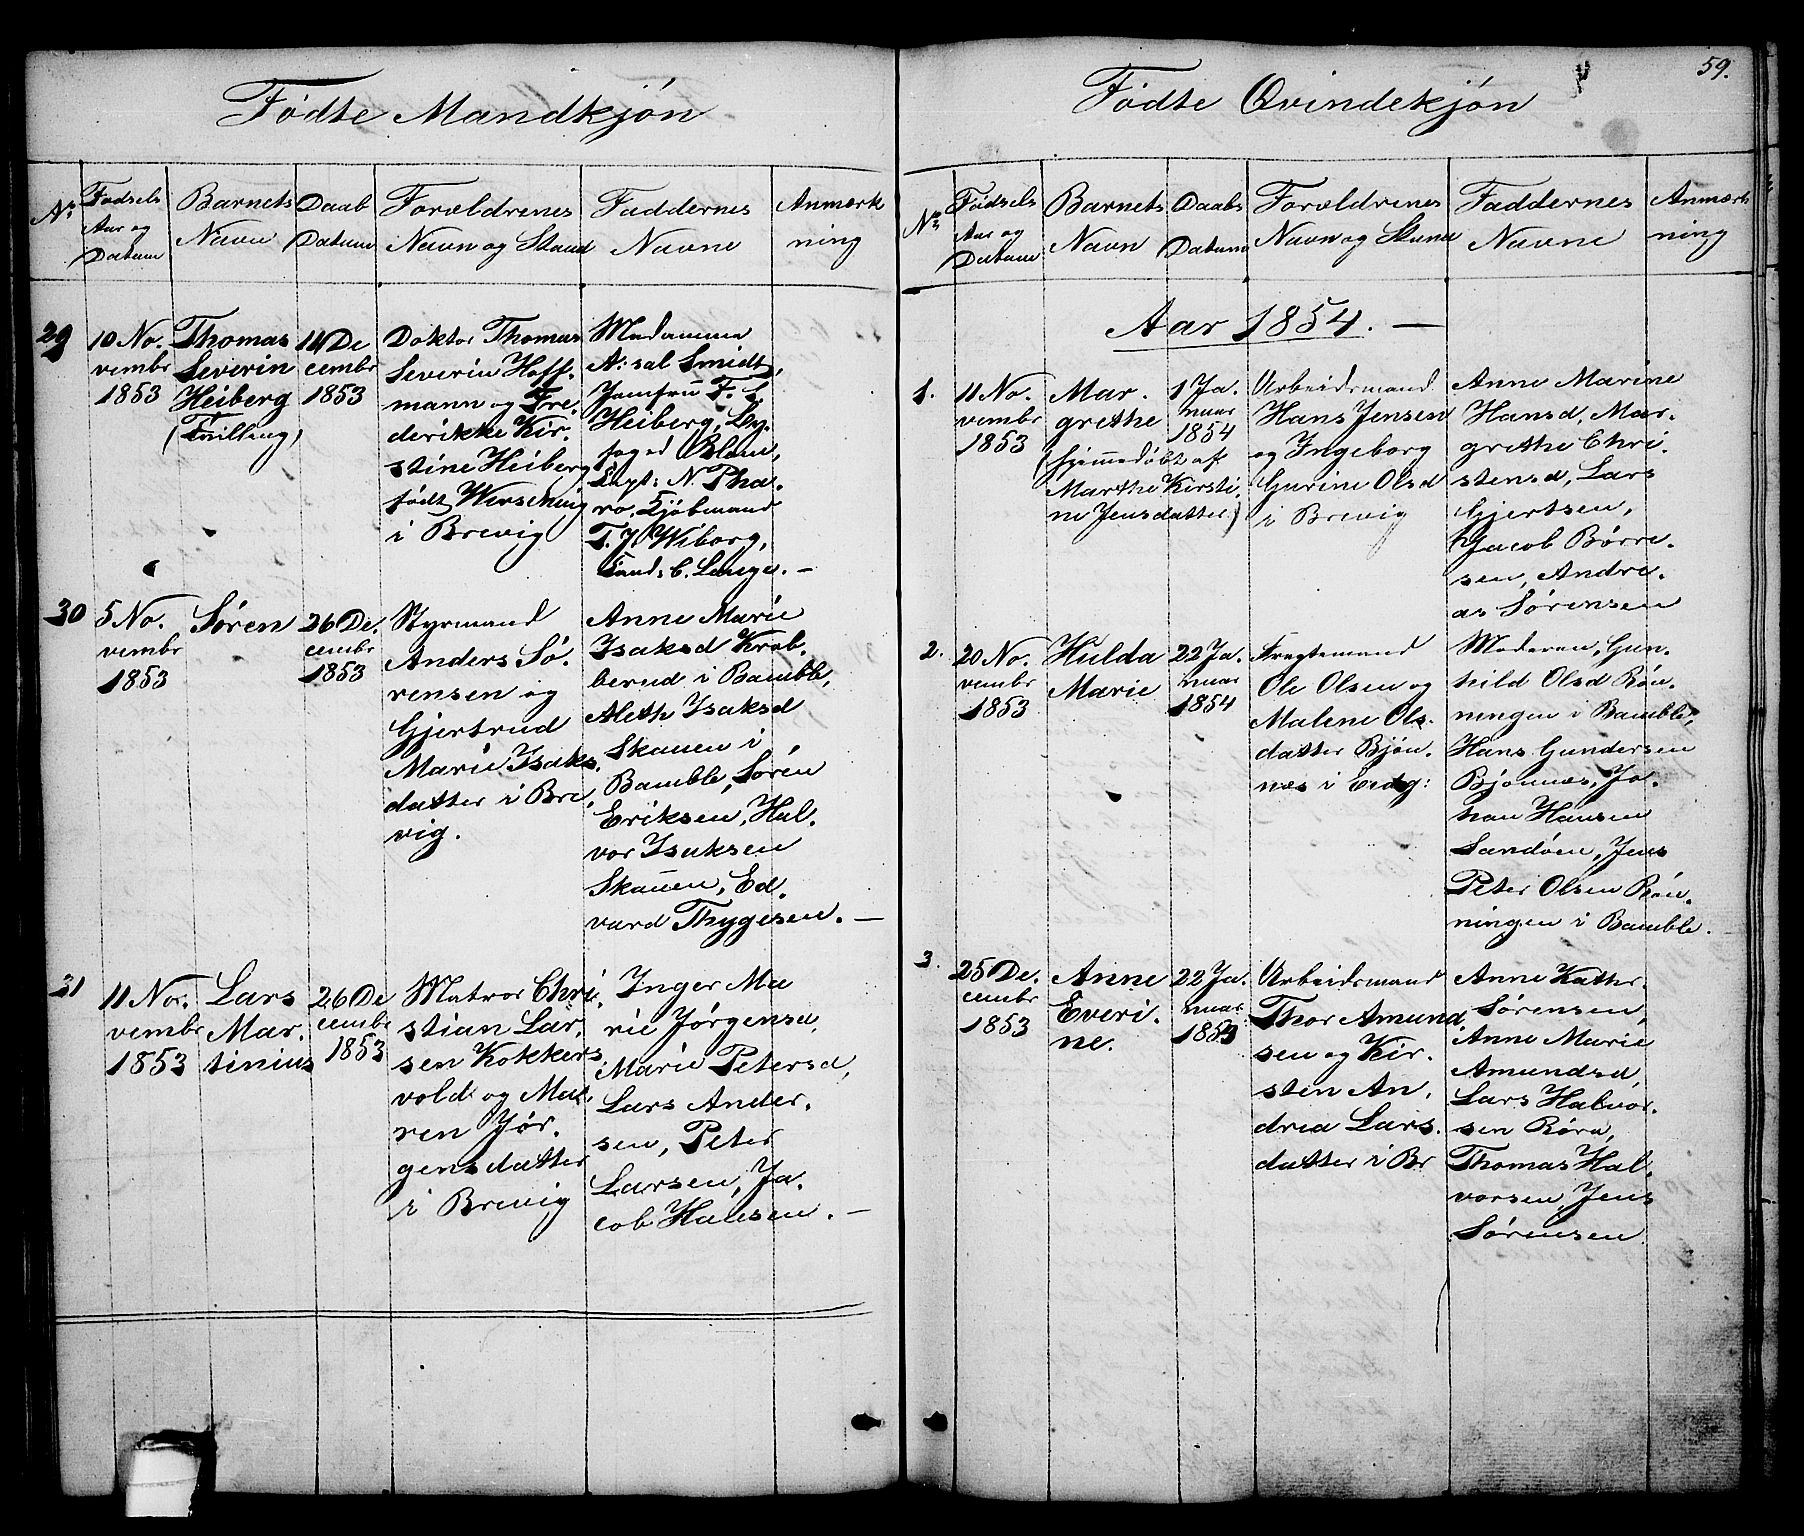 SAKO, Brevik kirkebøker, G/Ga/L0002: Klokkerbok nr. 2, 1846-1865, s. 59